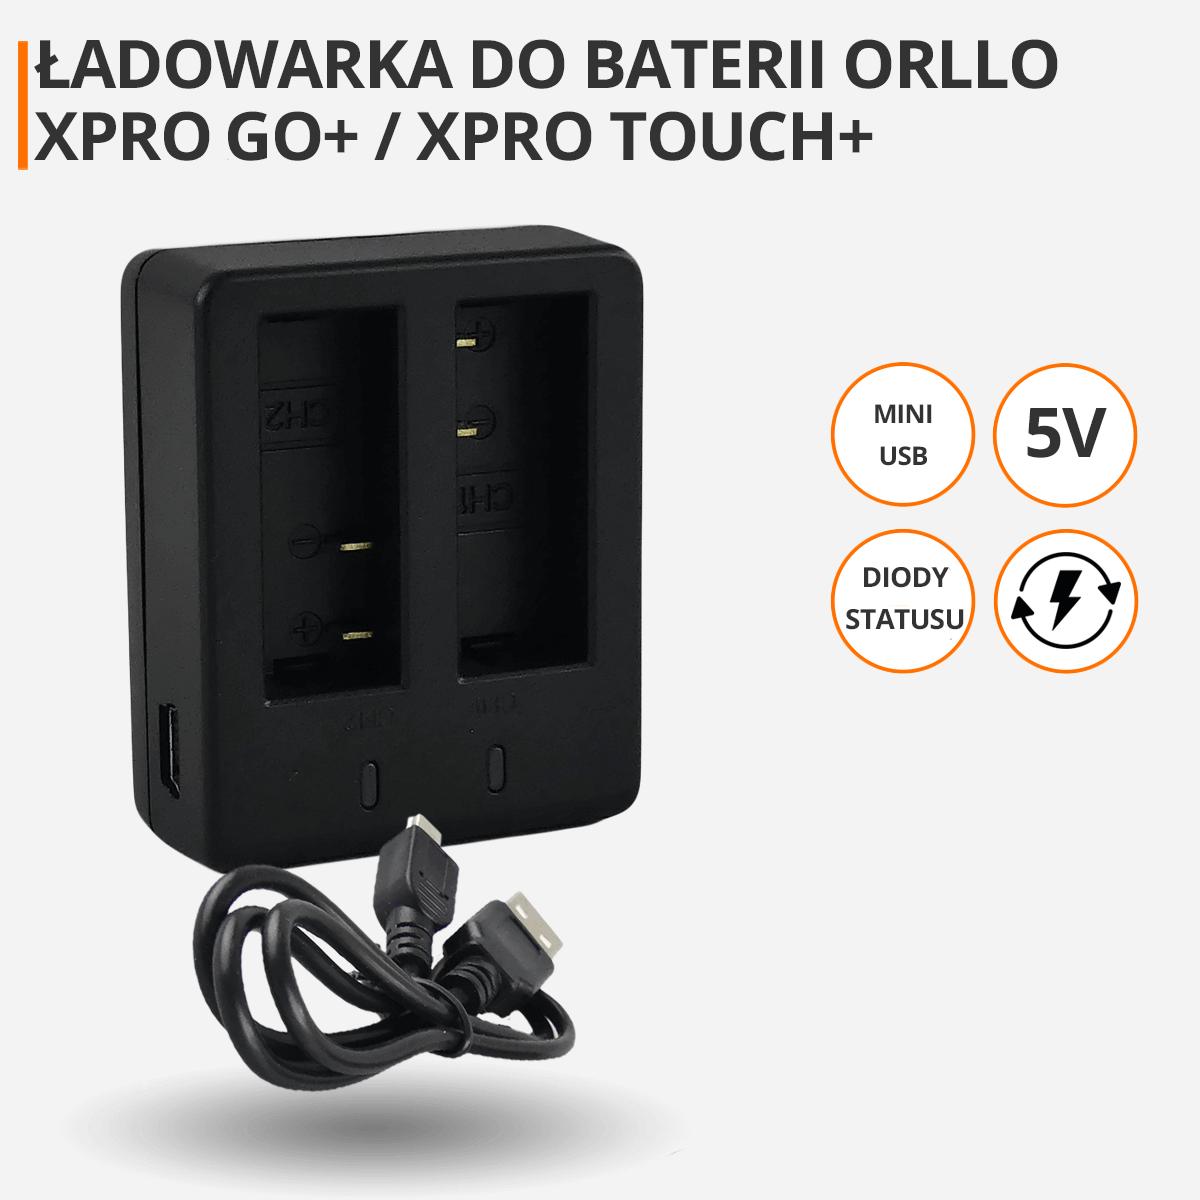 ladowarka-baterii-do-kamery-sportowej-orllo-xpro